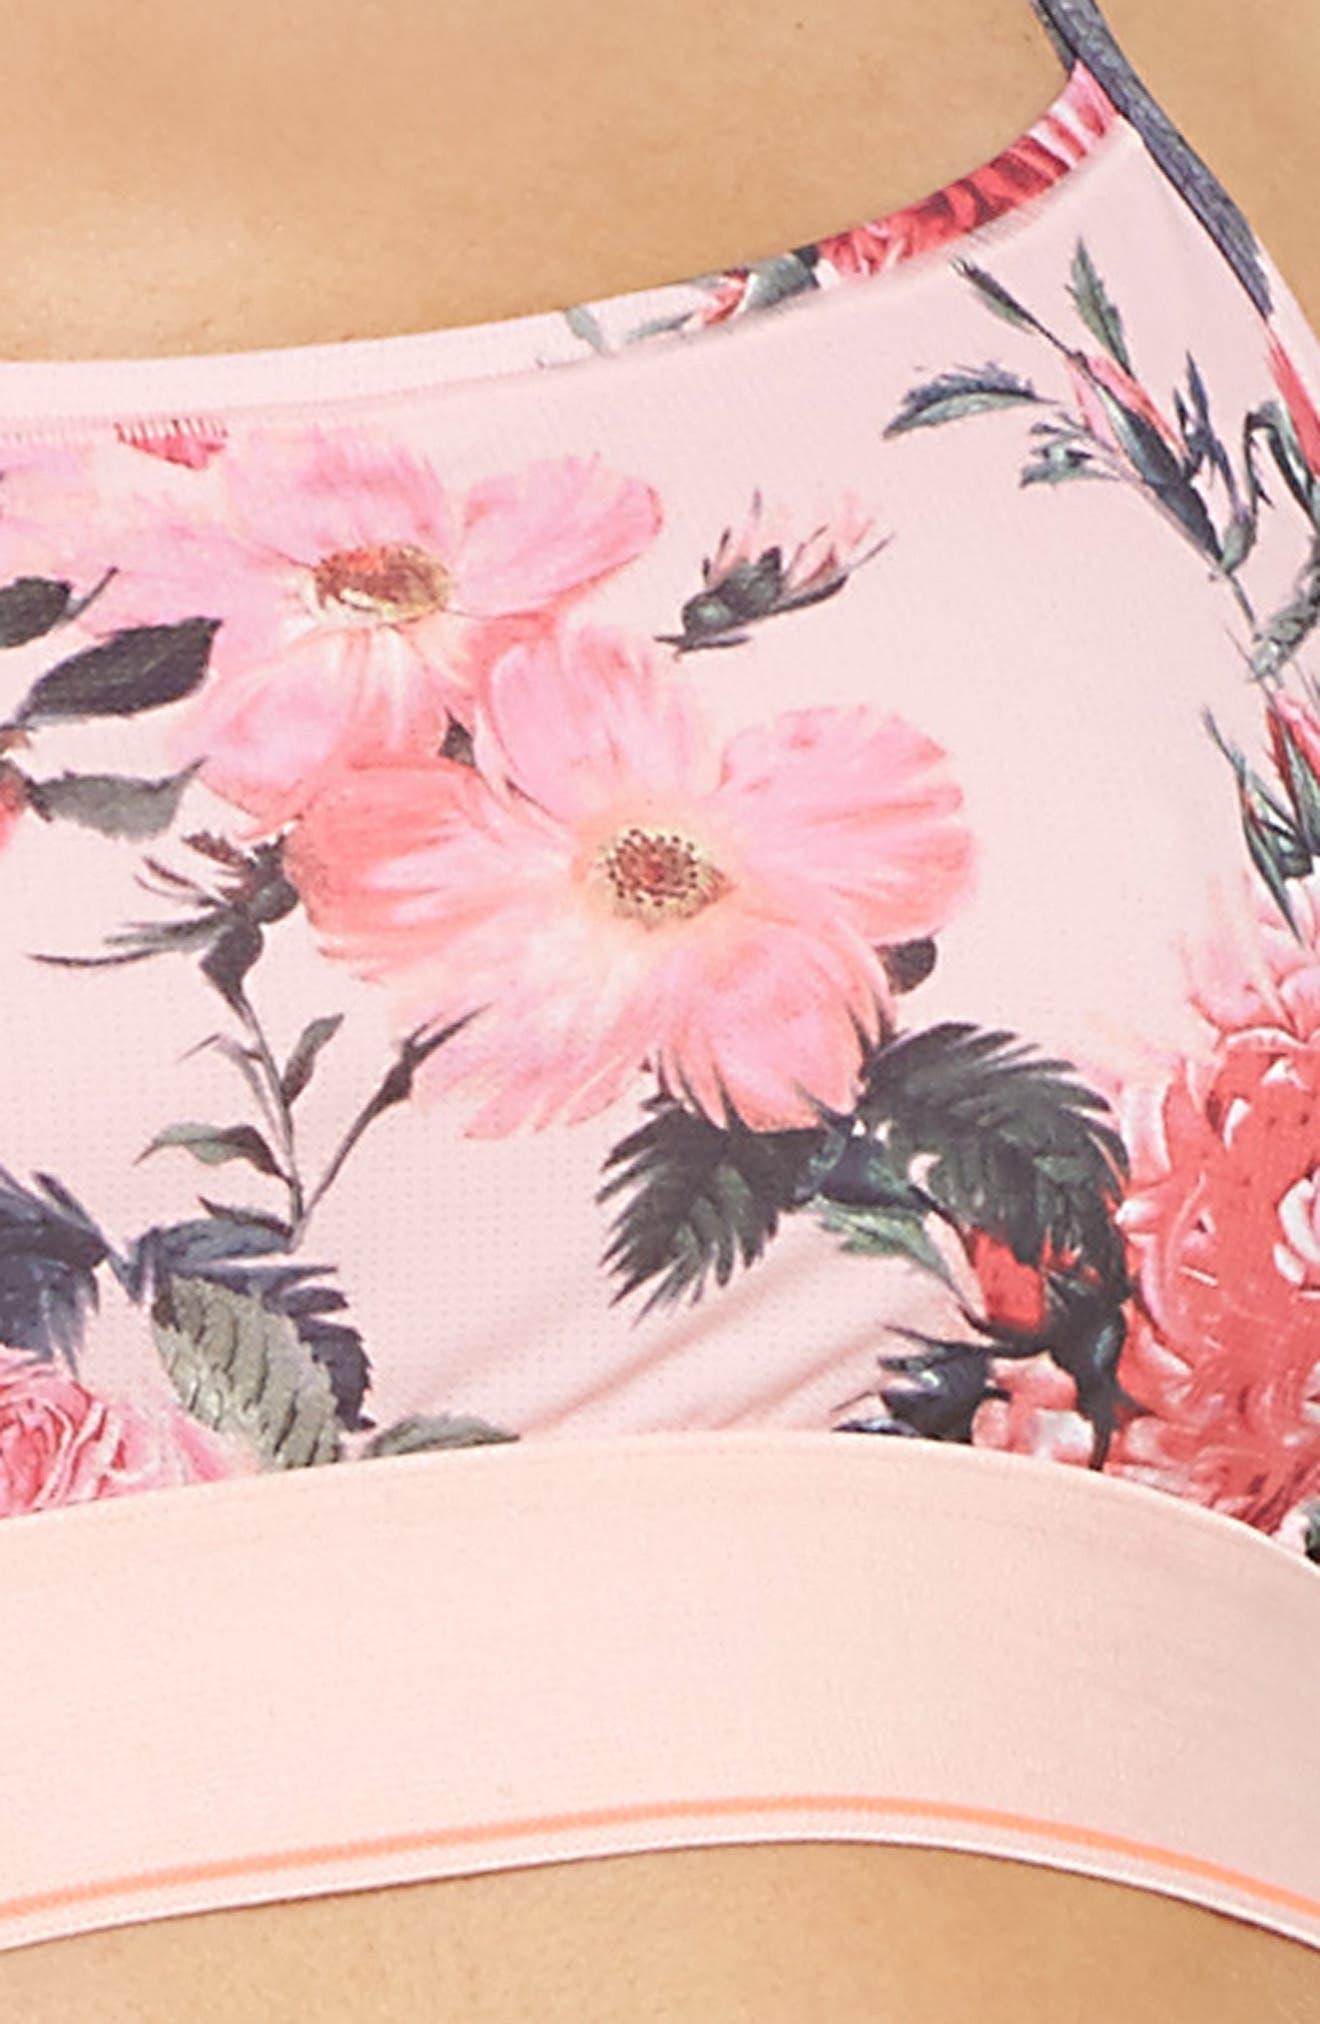 Floral Tomboy Bralette,                             Alternate thumbnail 9, color,                             Pink Multi